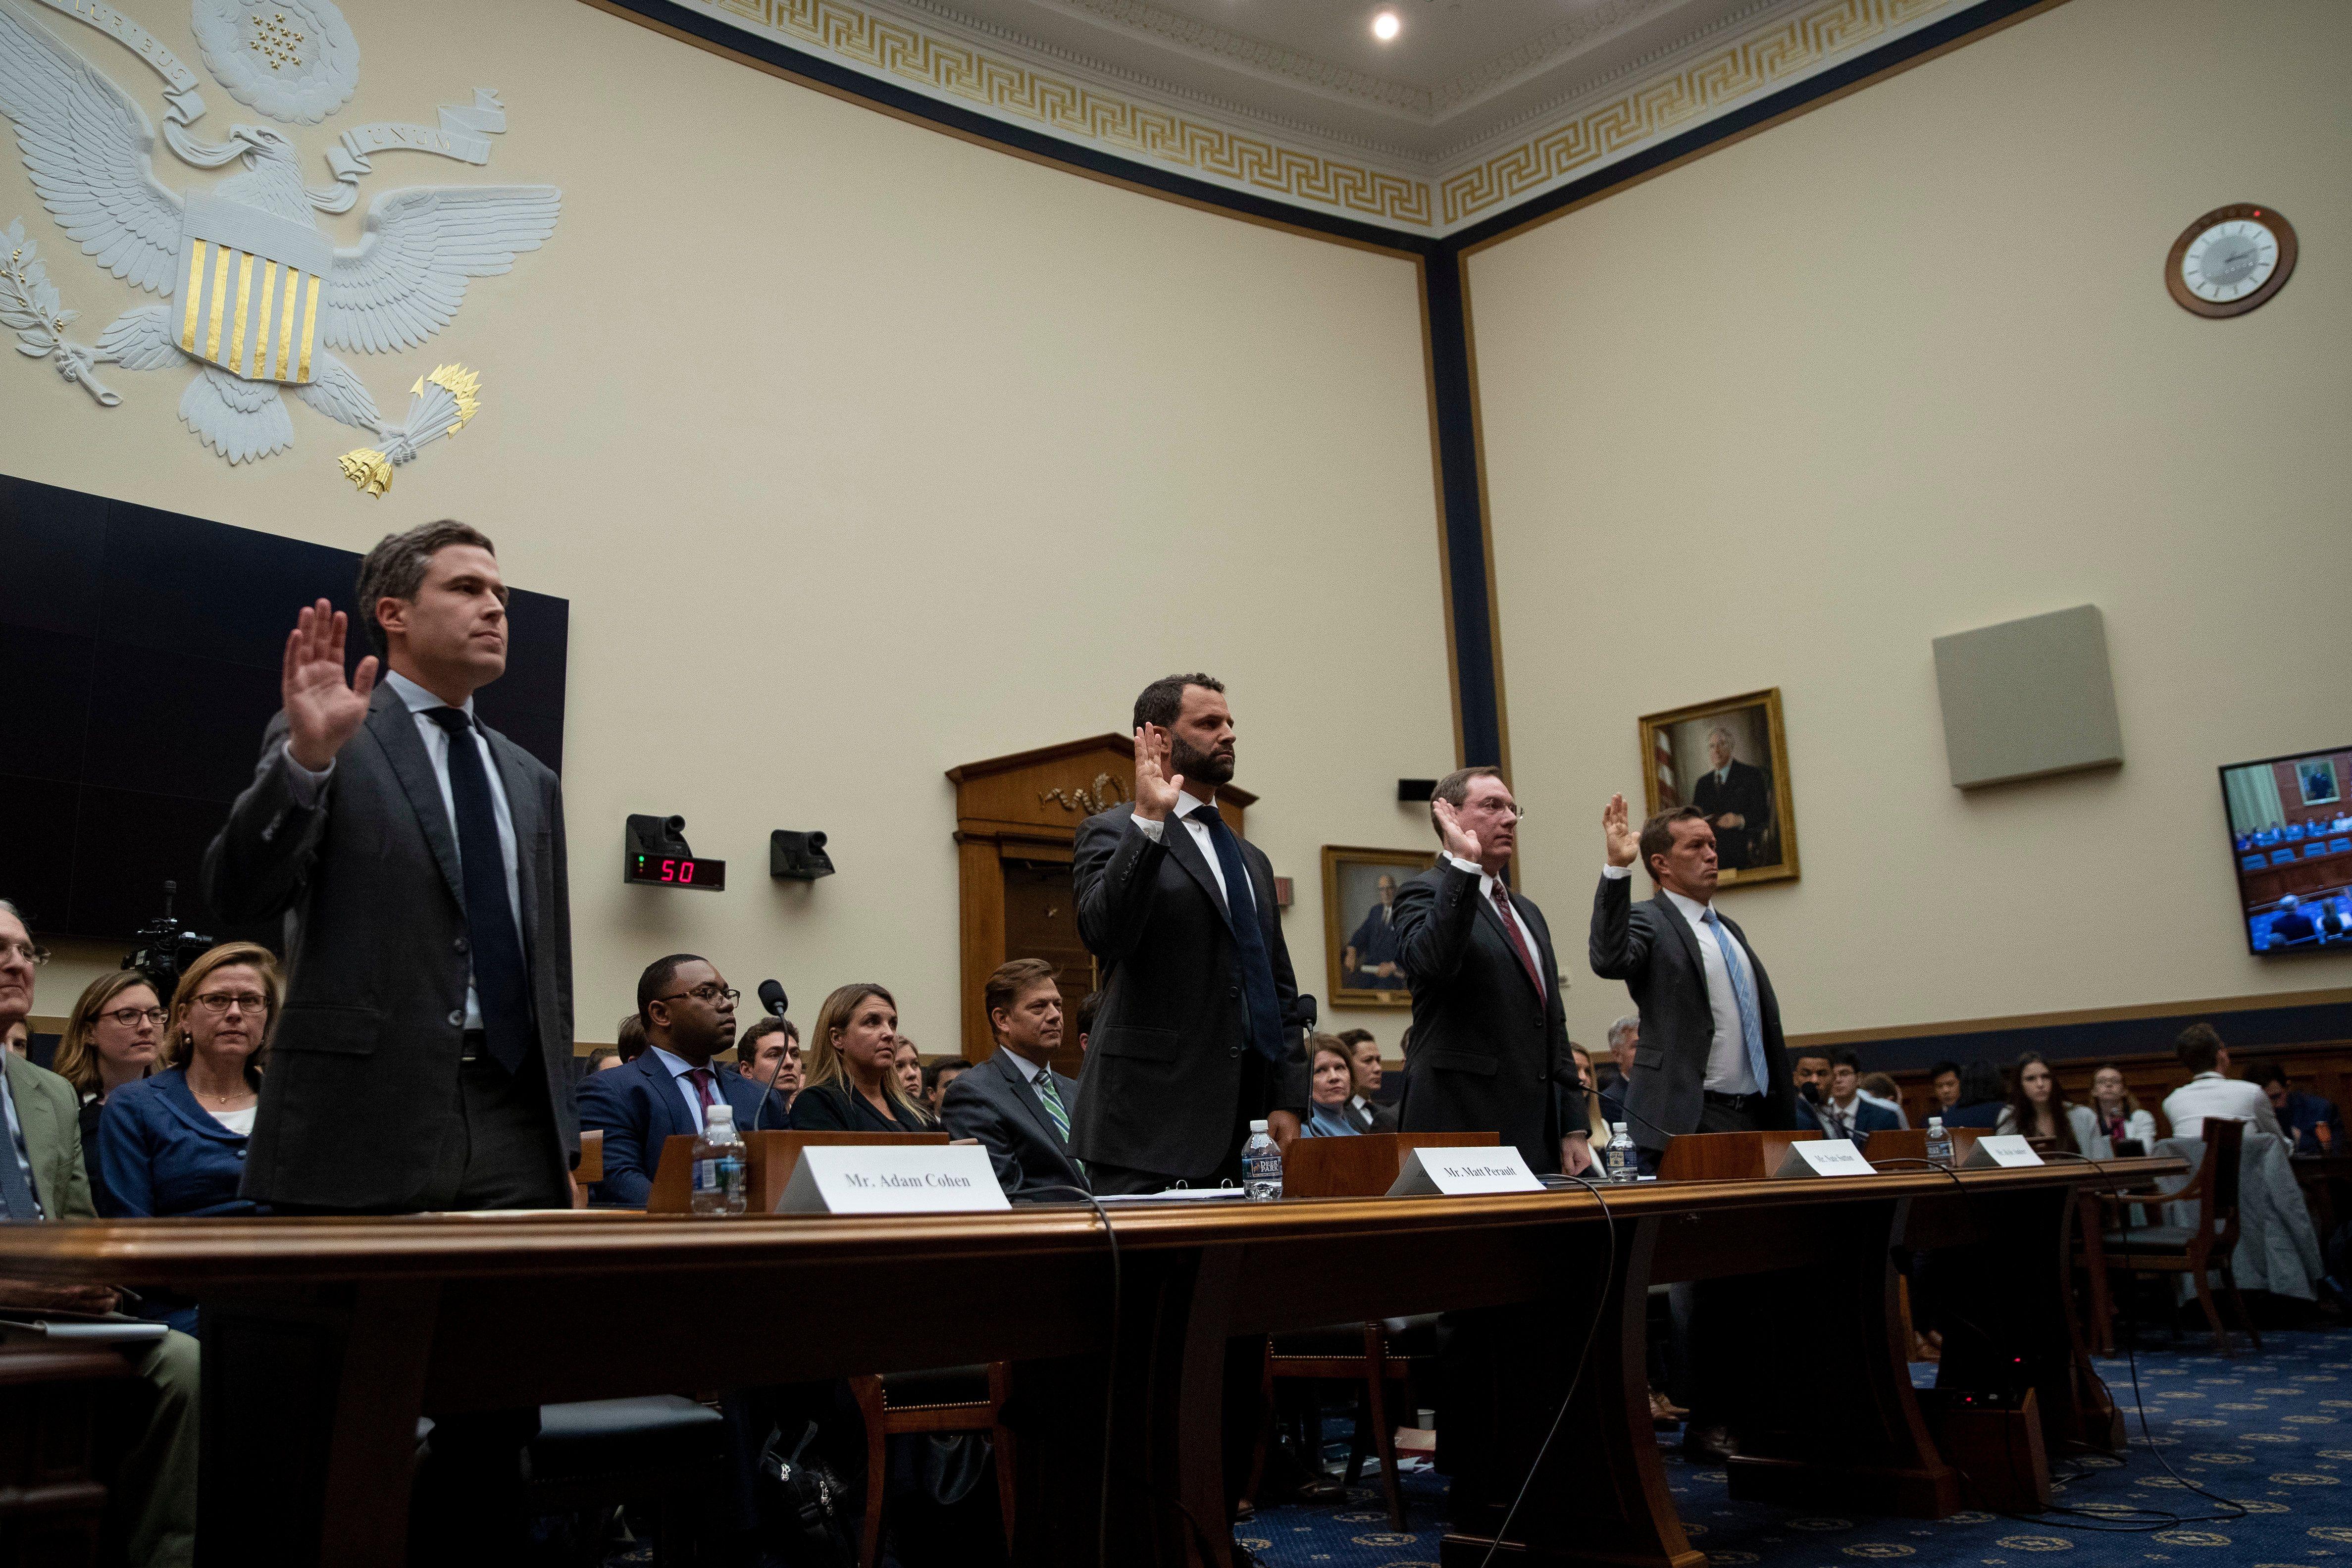 Justice Department Opens Antitrust Review of Big Tech